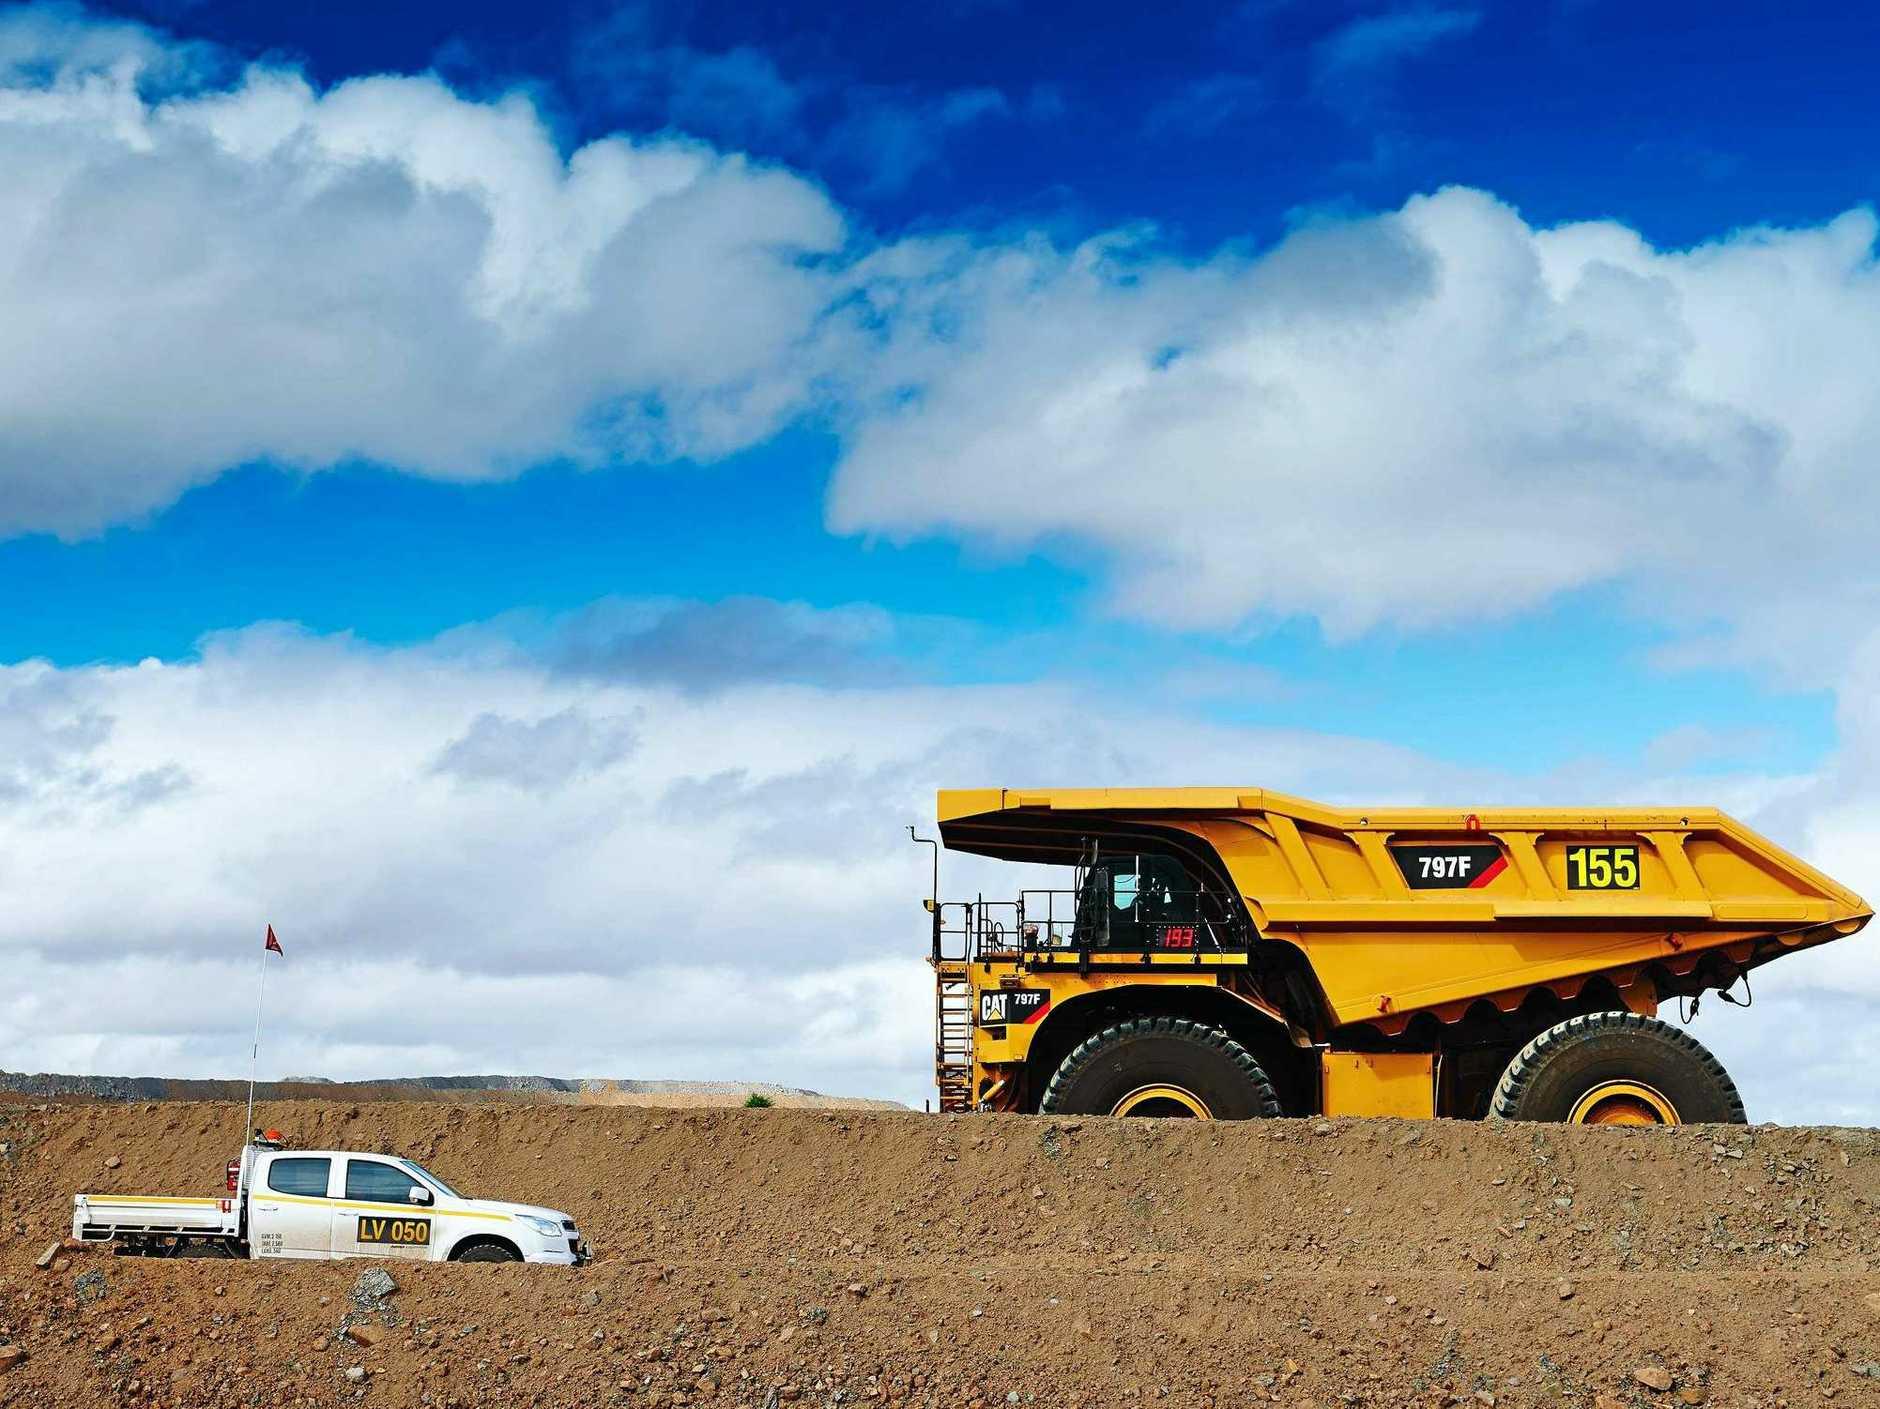 Generic mine BHP coal Daunia operations in central Queensland. Picture: BHPcoal mining coal mine